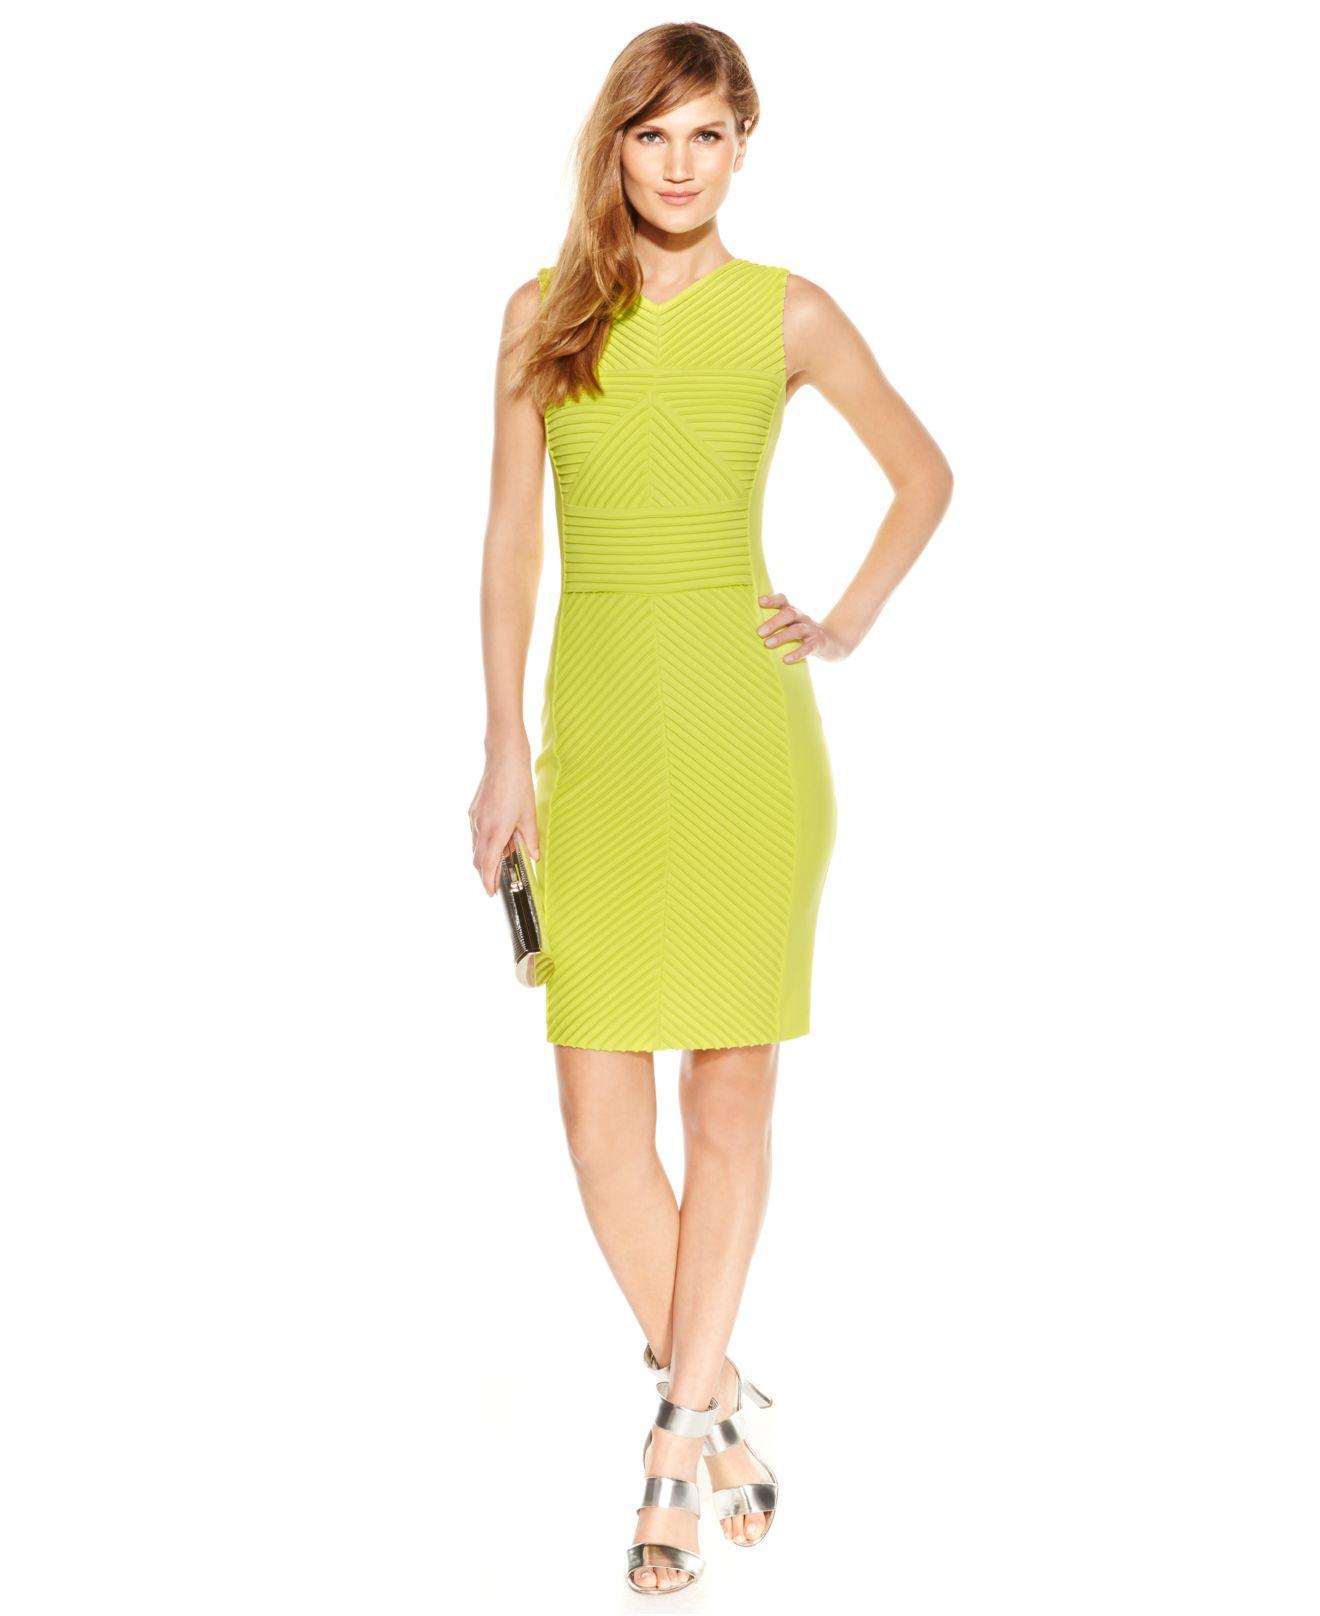 Calvin Klein Yellow Dress